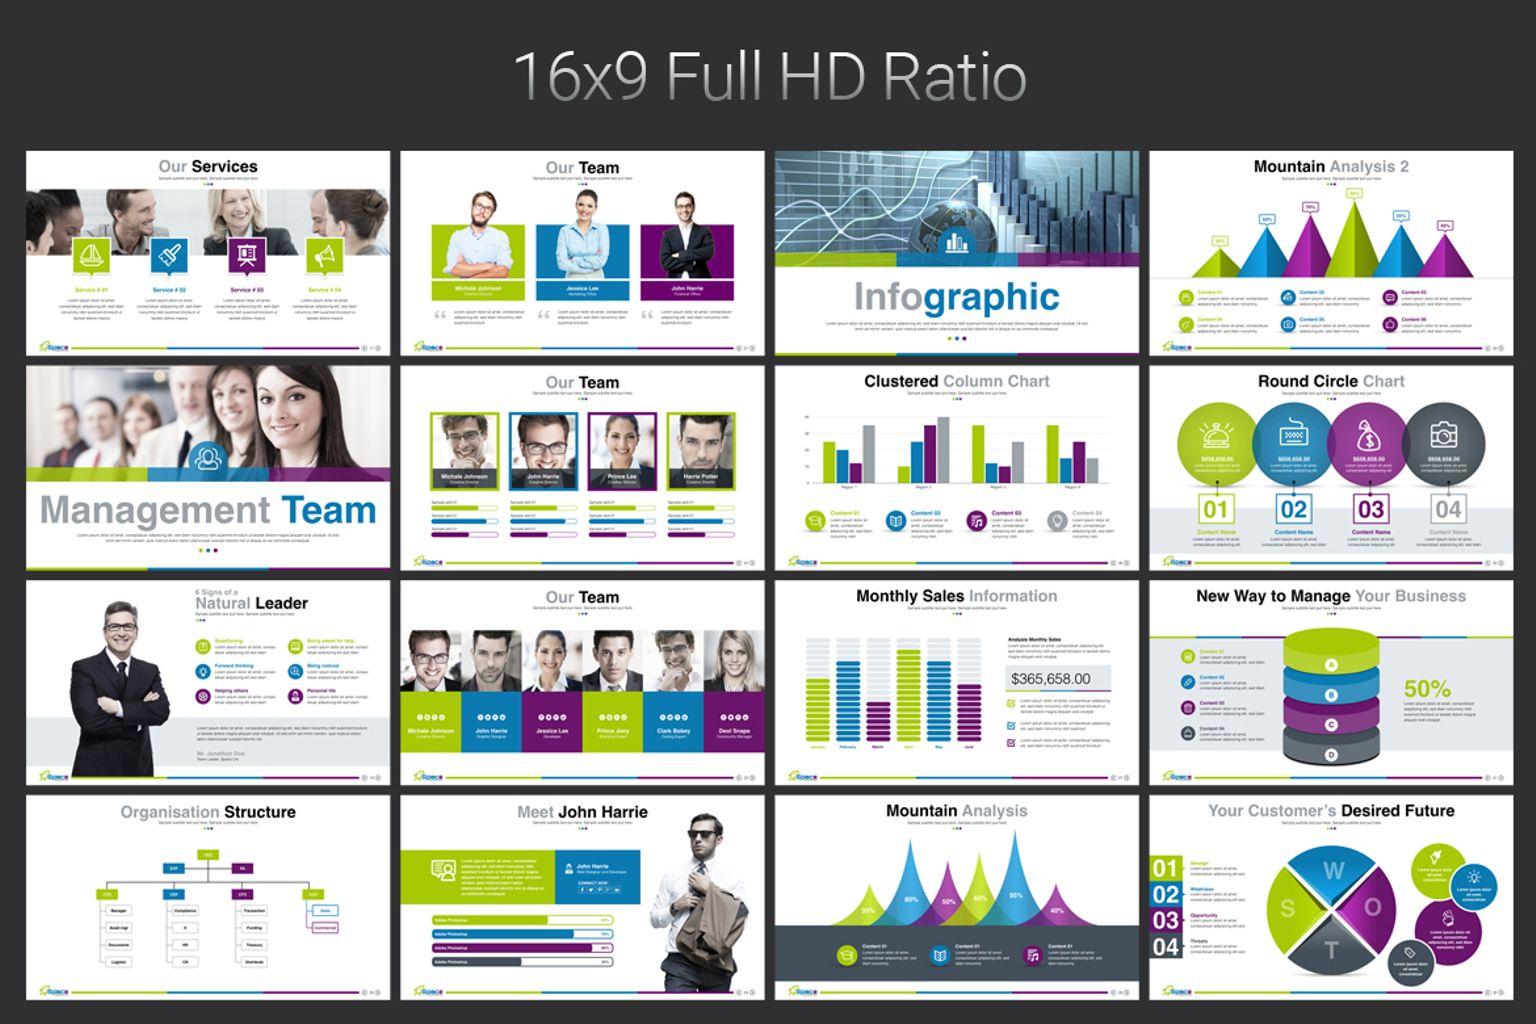 https://s3.tmimgcdn.com/templates/4081/scr/02_16x9-Ratio-Full-HD-Presentation.jpg